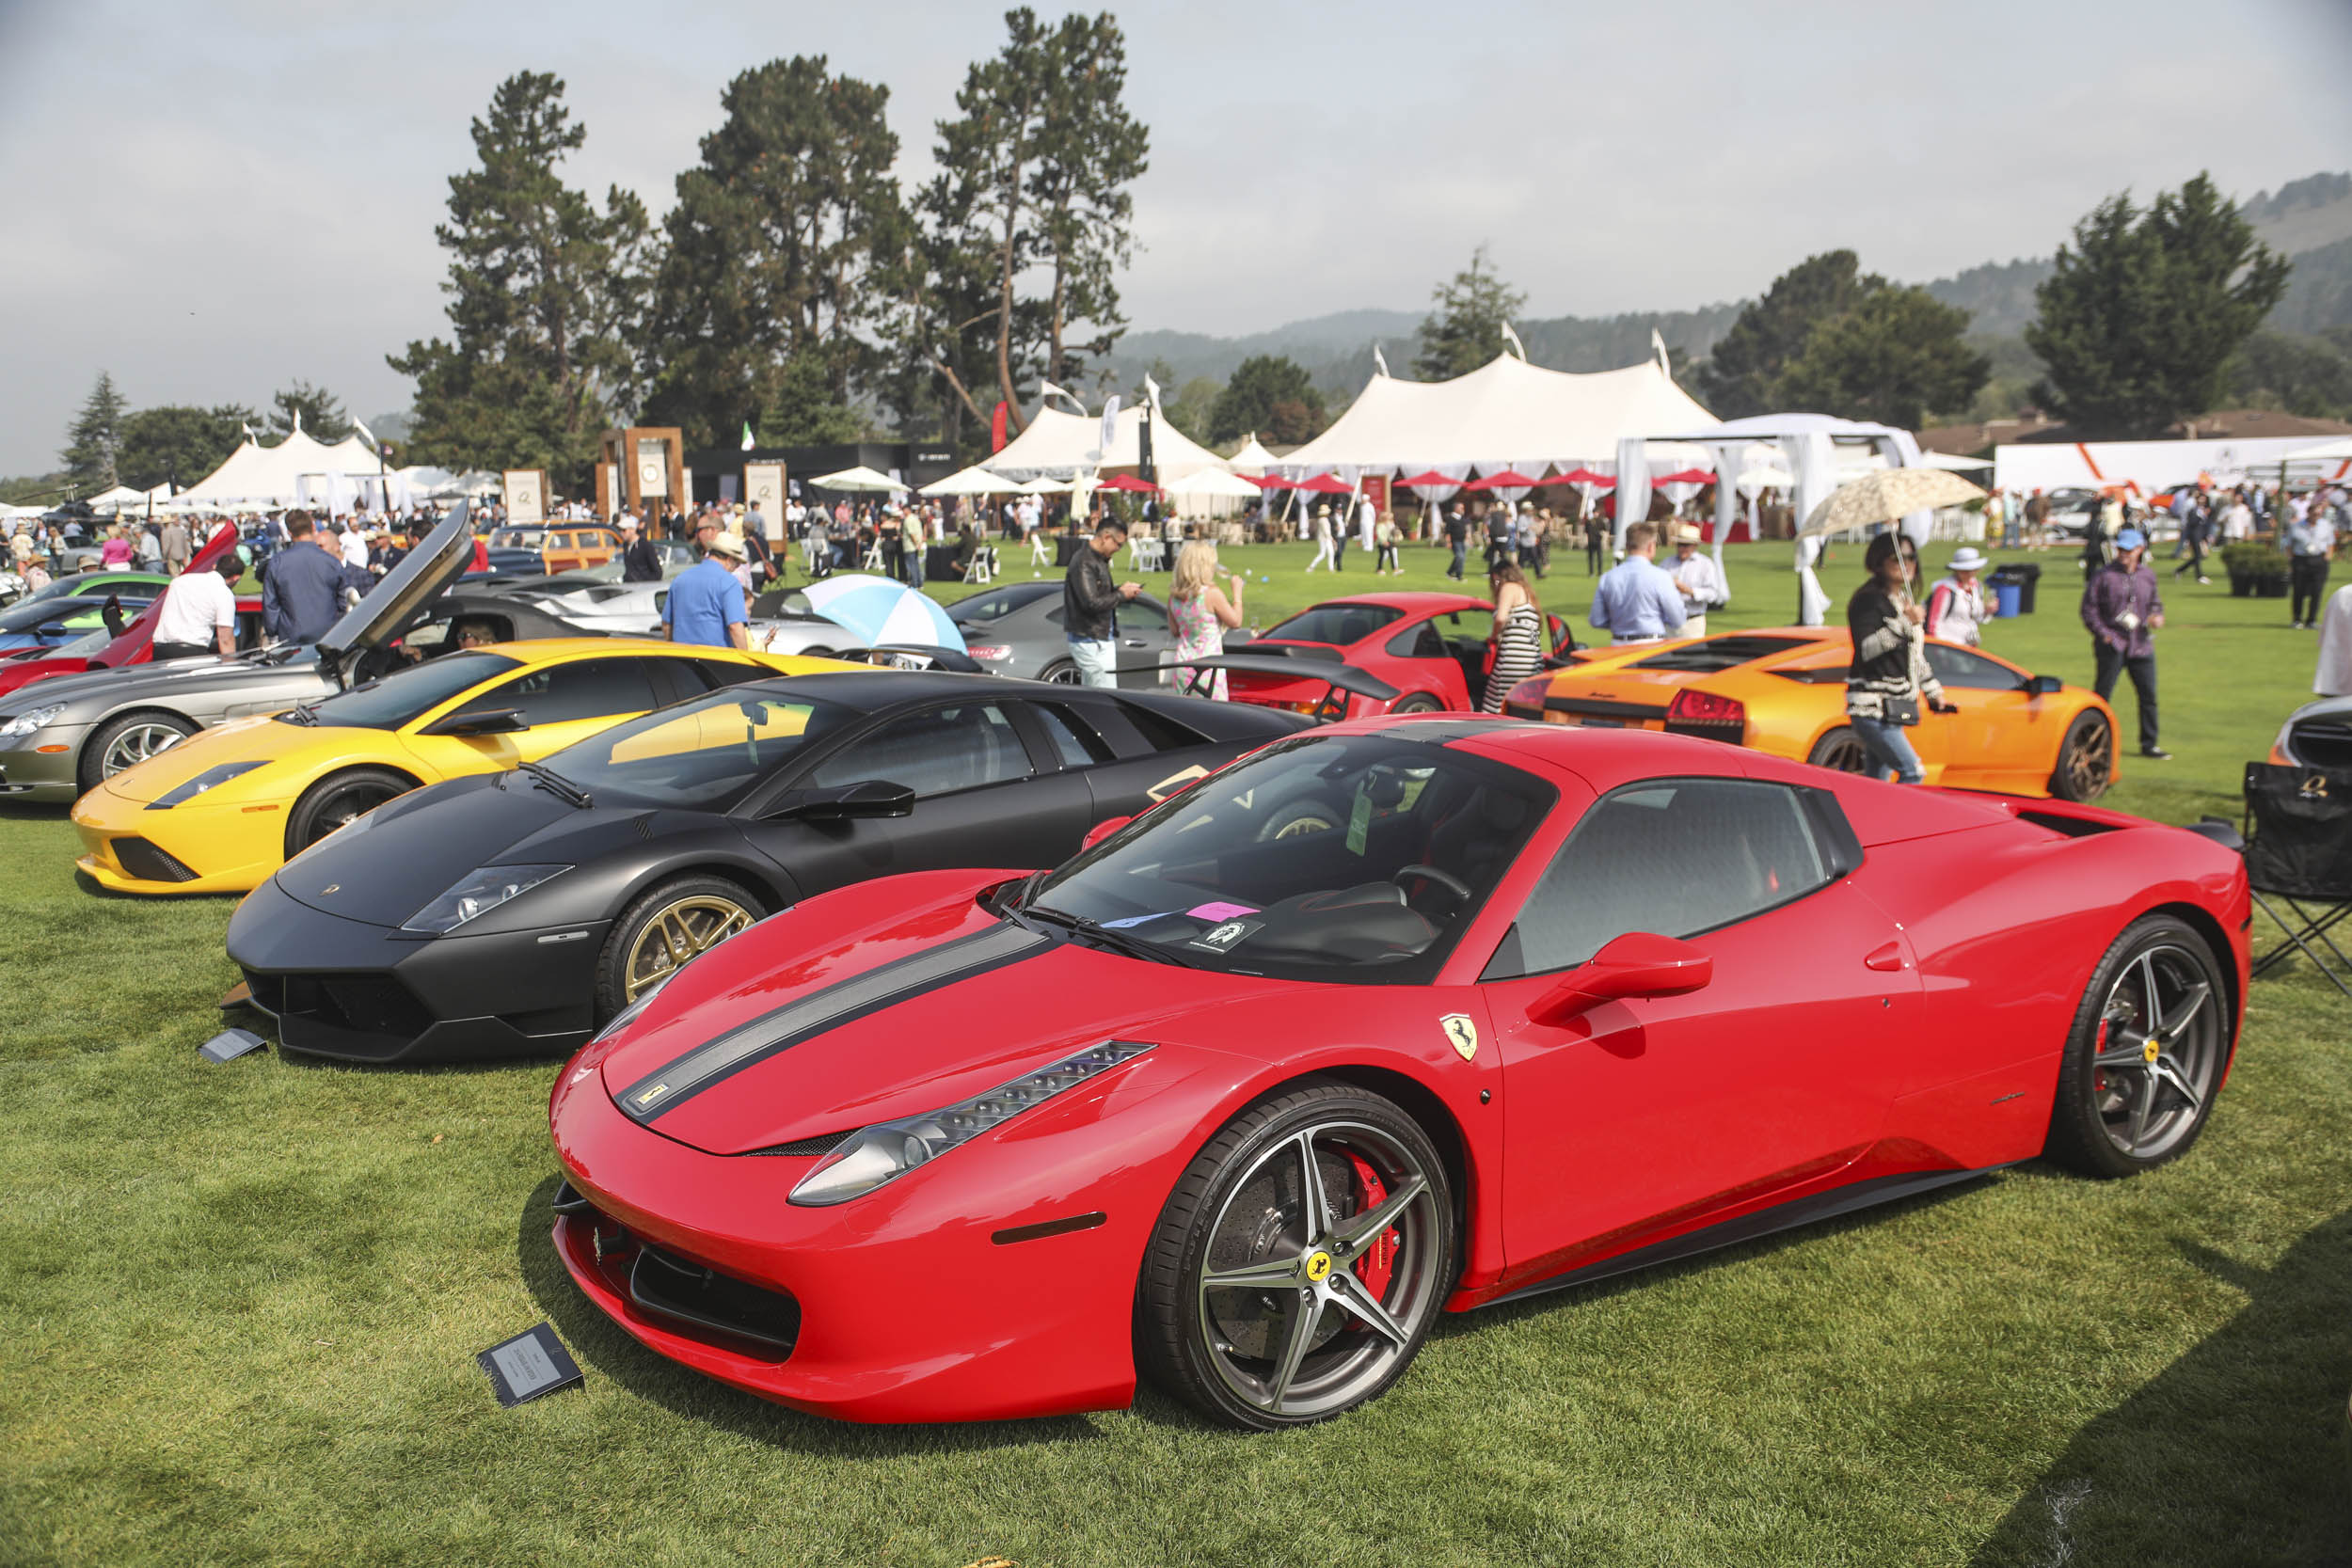 exotic Ferrari and Lamborghinis at The Quail